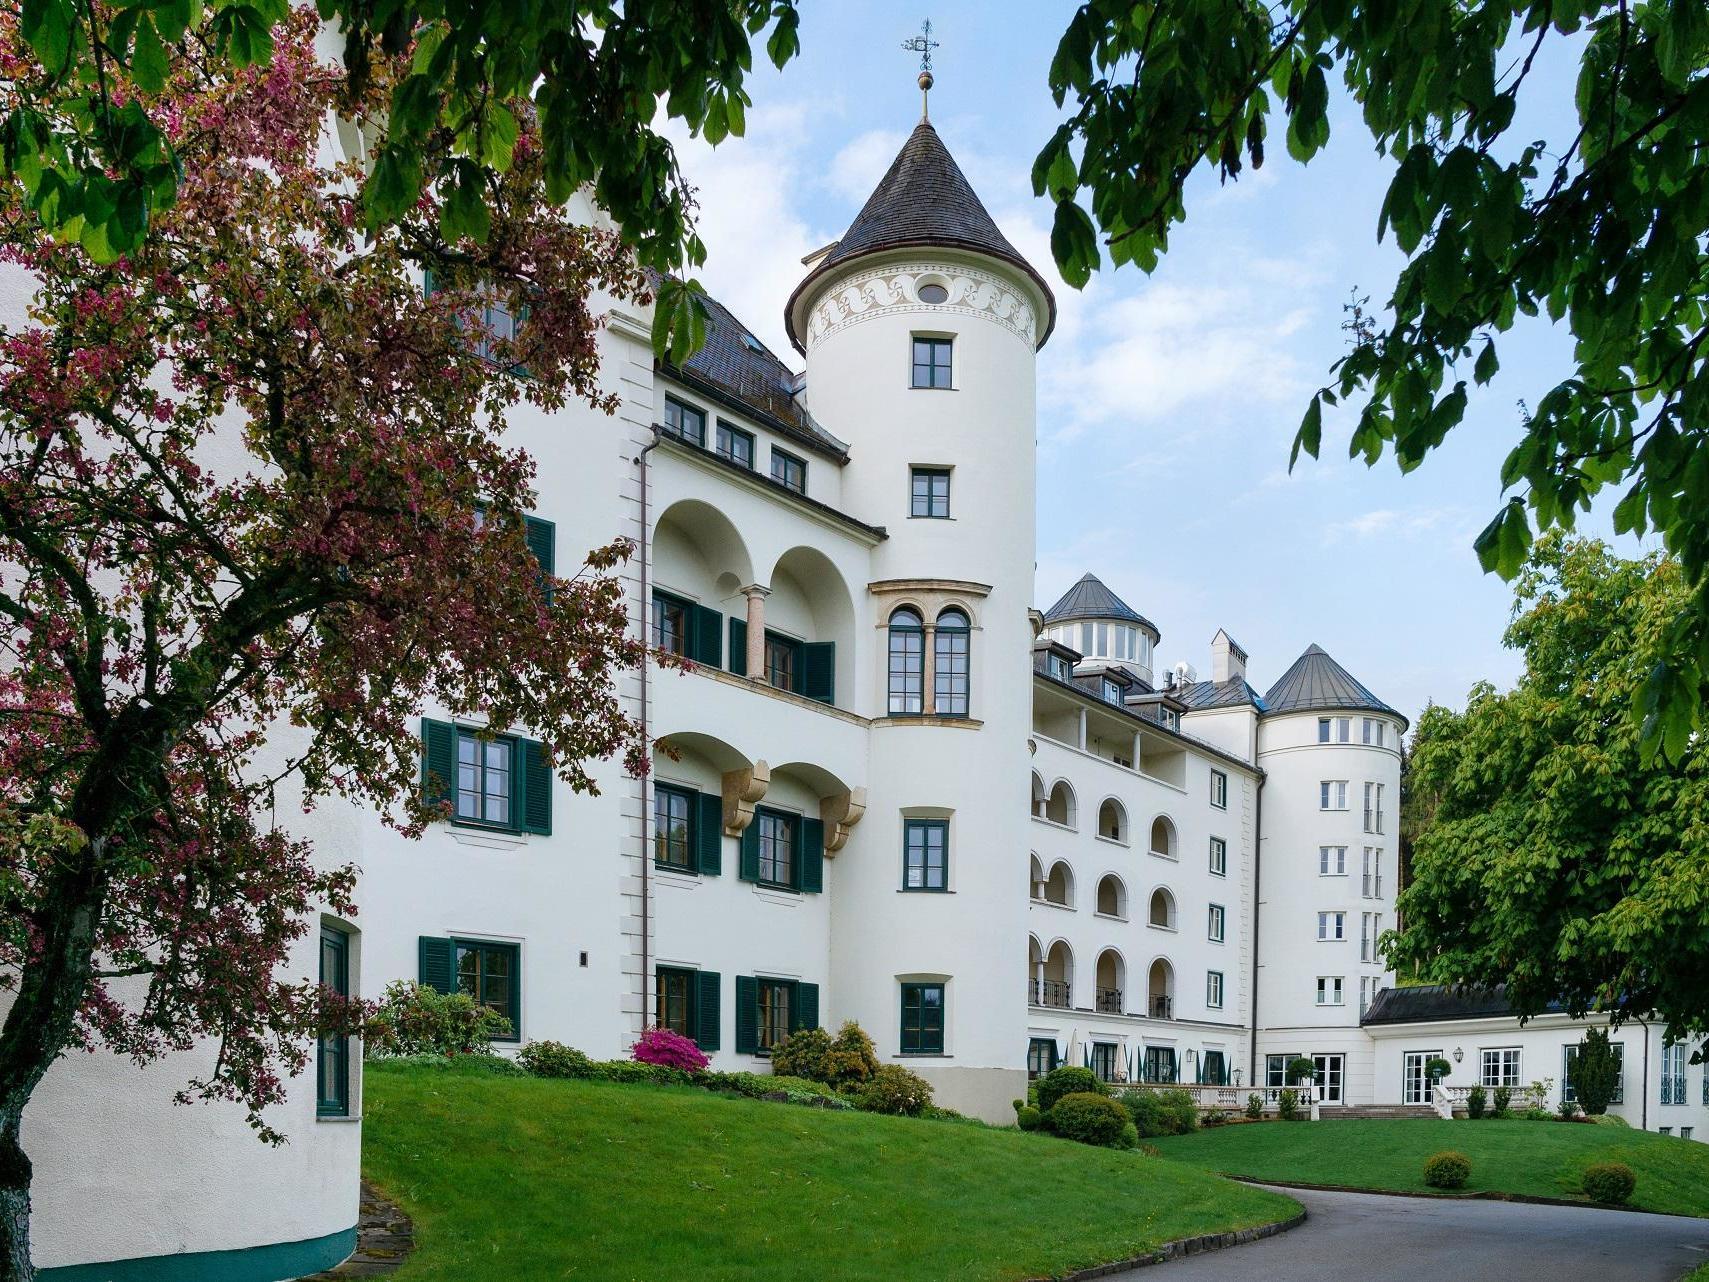 exterior view of Schloss Pichlarn